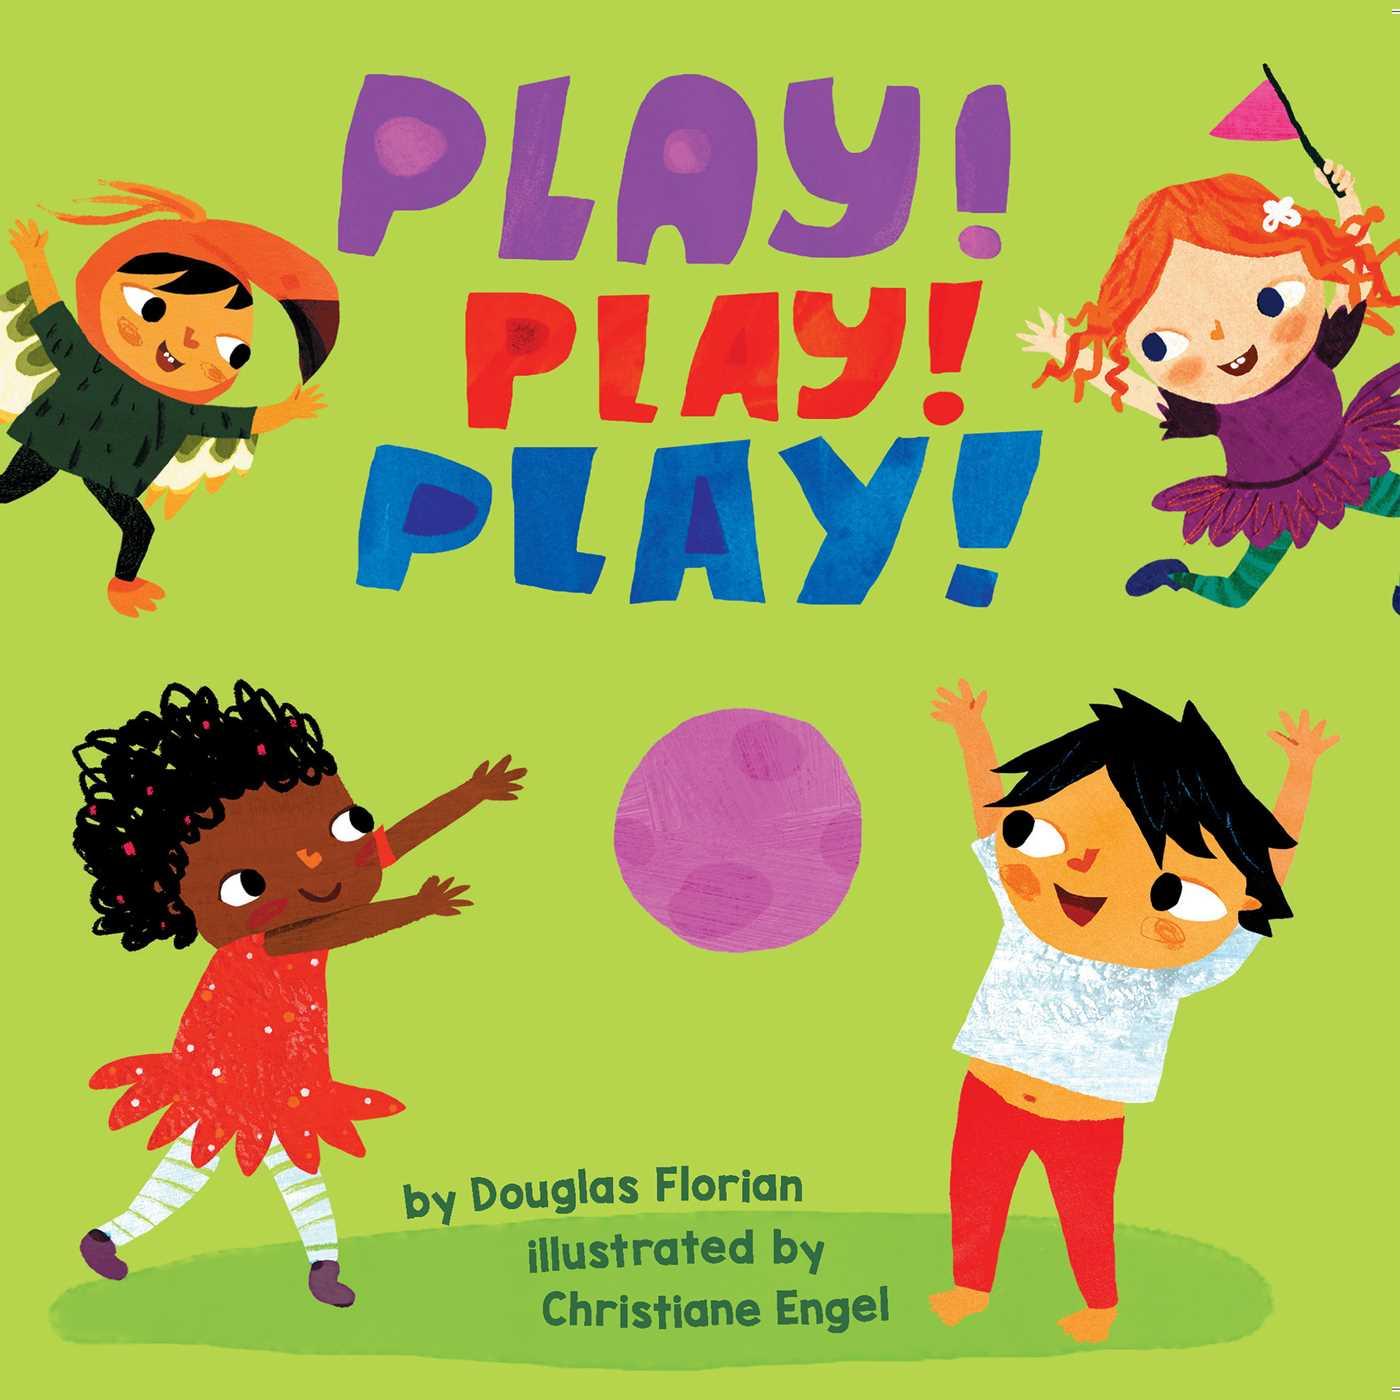 Play play play 9781499804843 hr